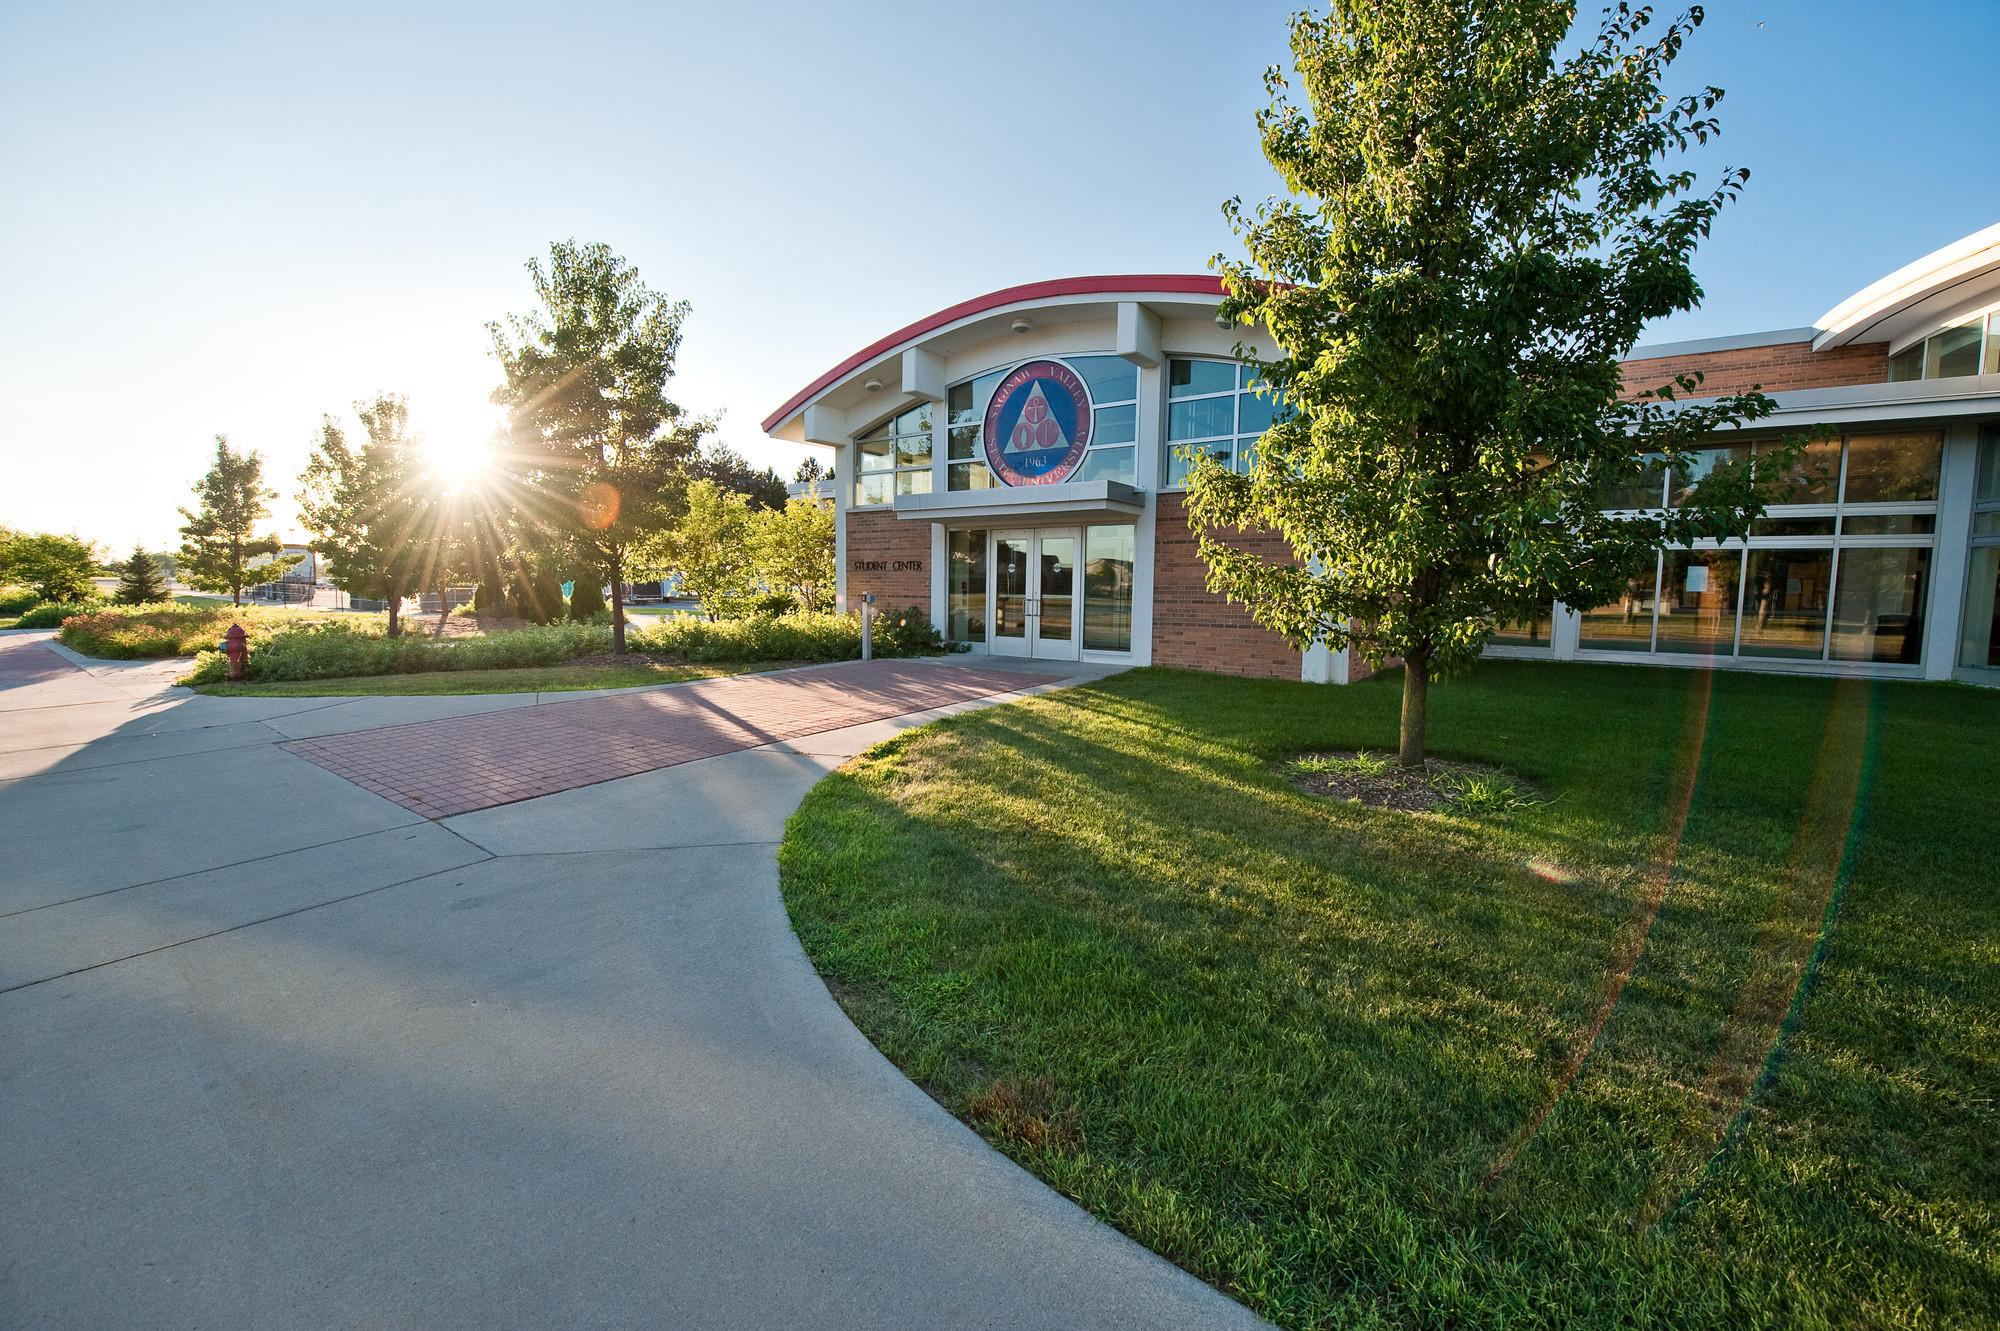 Rs389858 student life center 1532 8 9 lpr